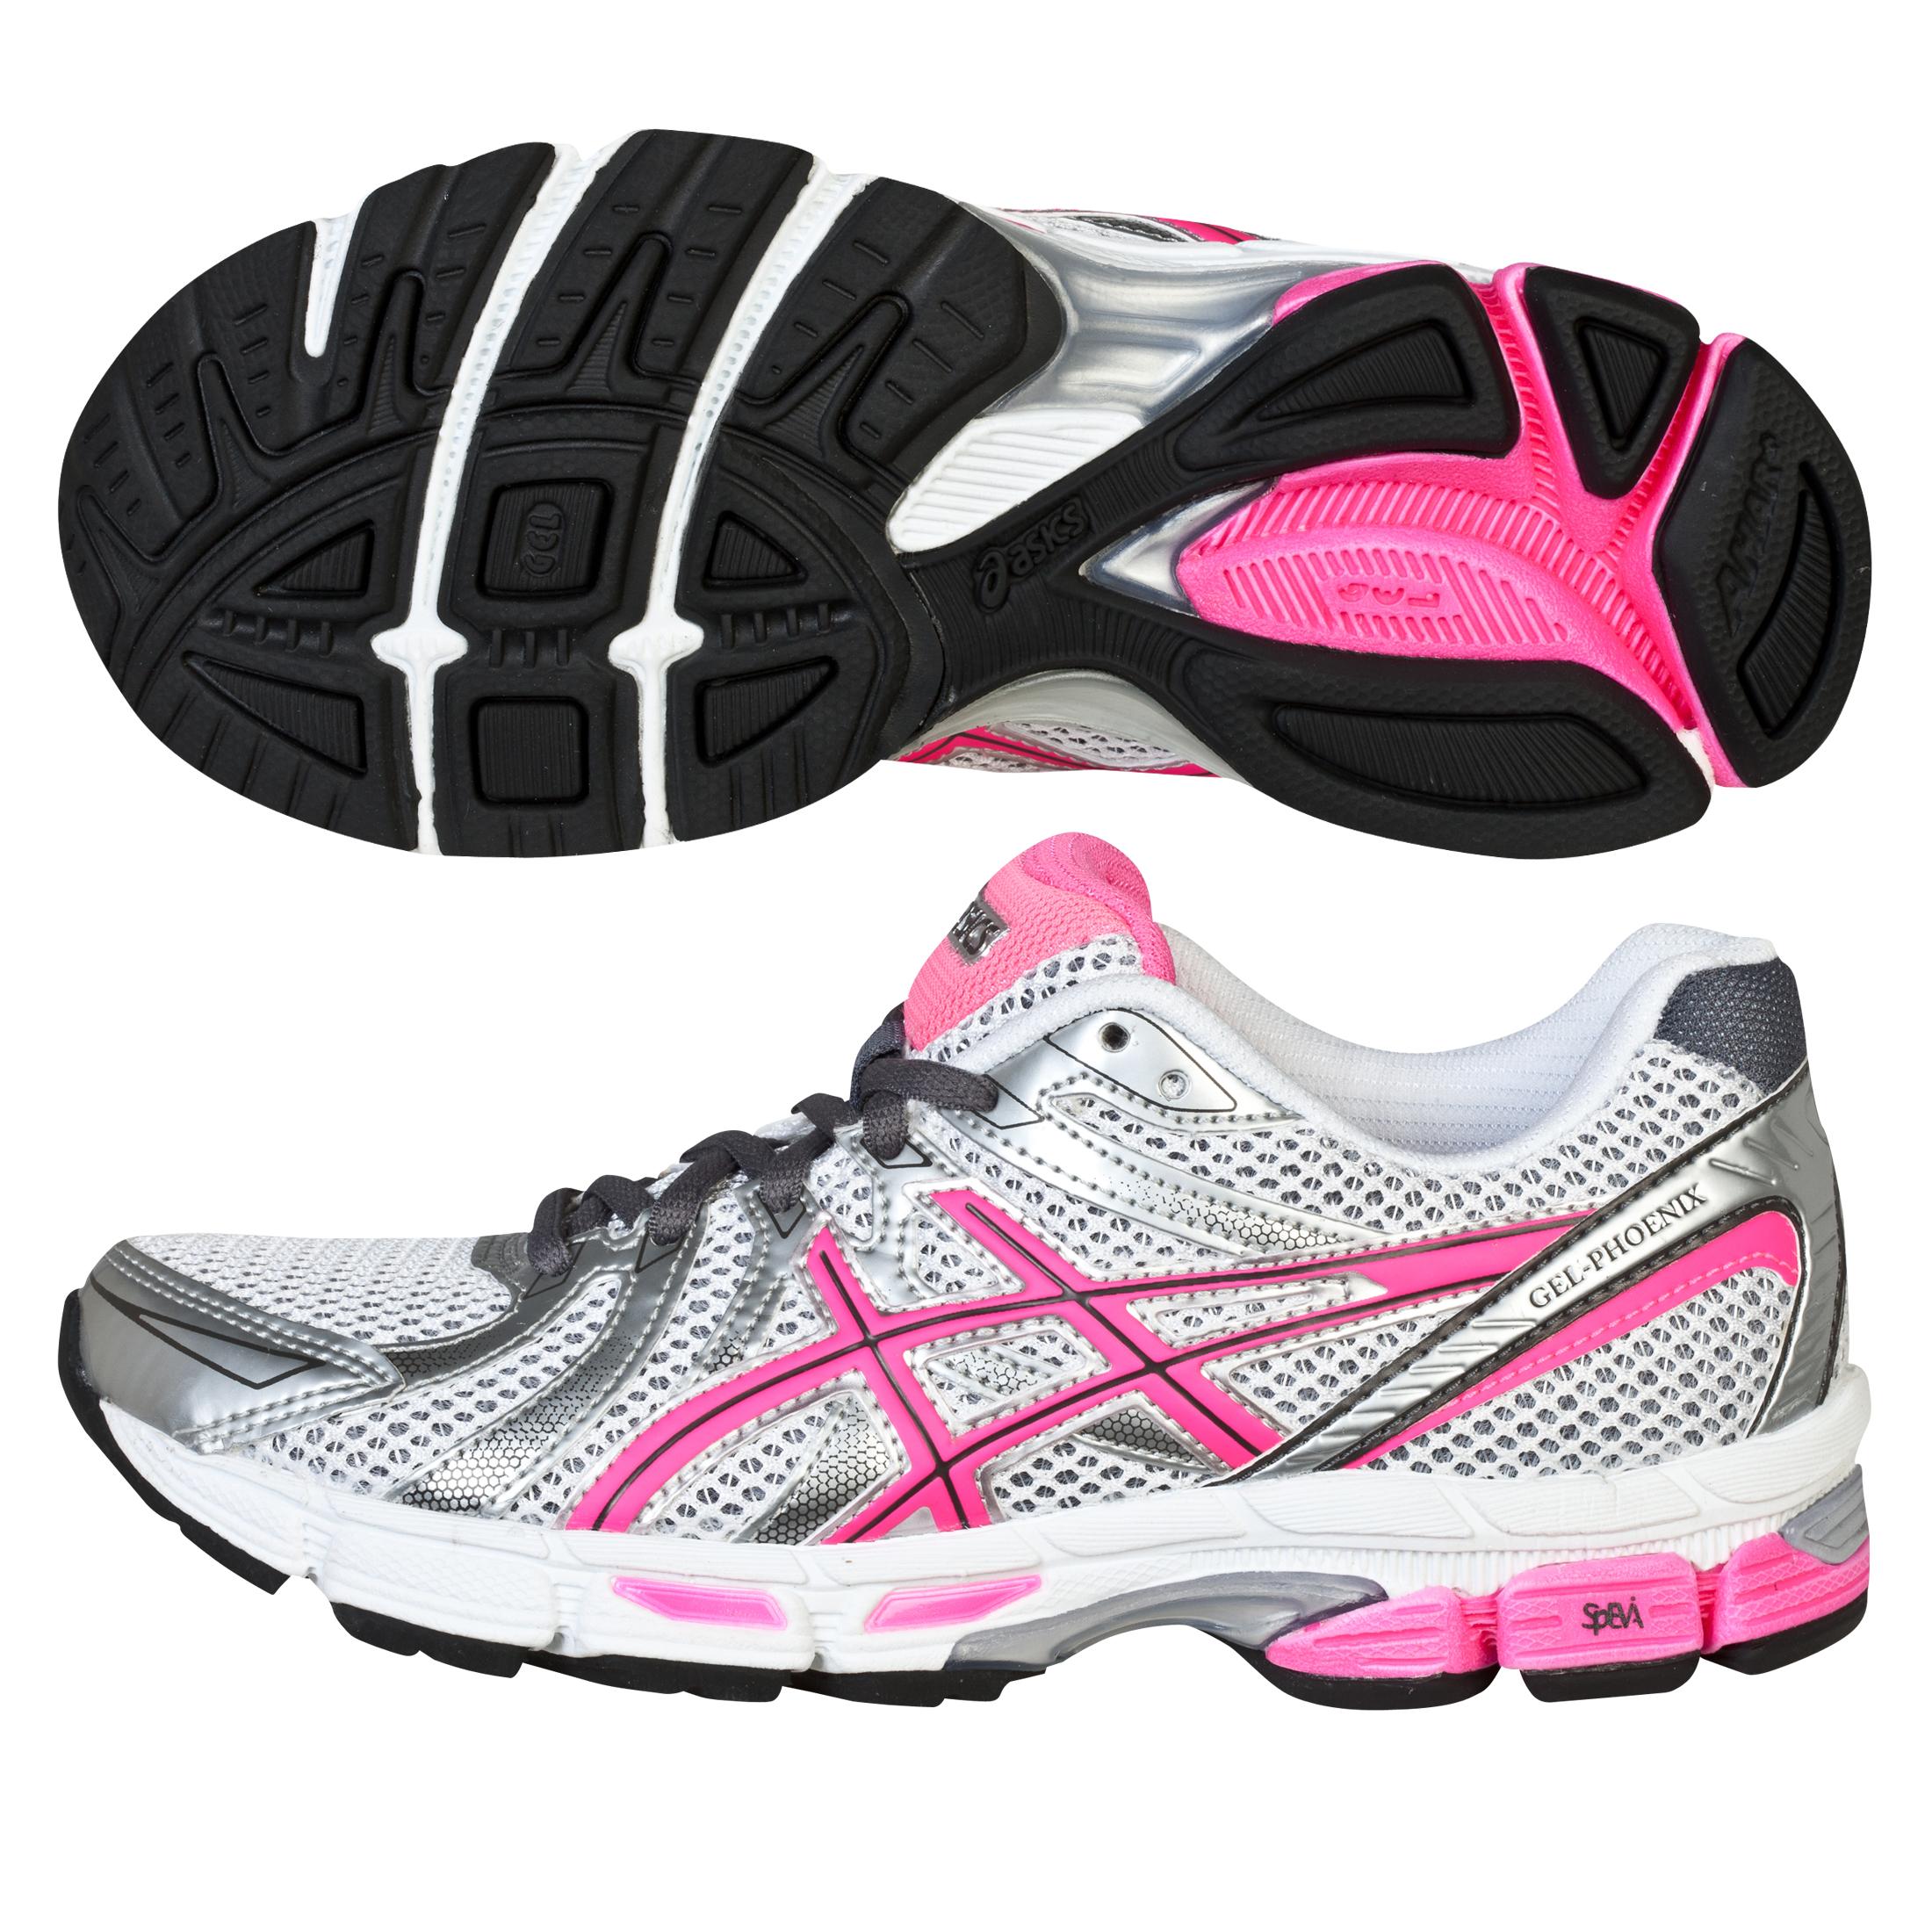 Running Gel Phoenix 5 Trainer - White/Neon Pink/Silver - Womens White